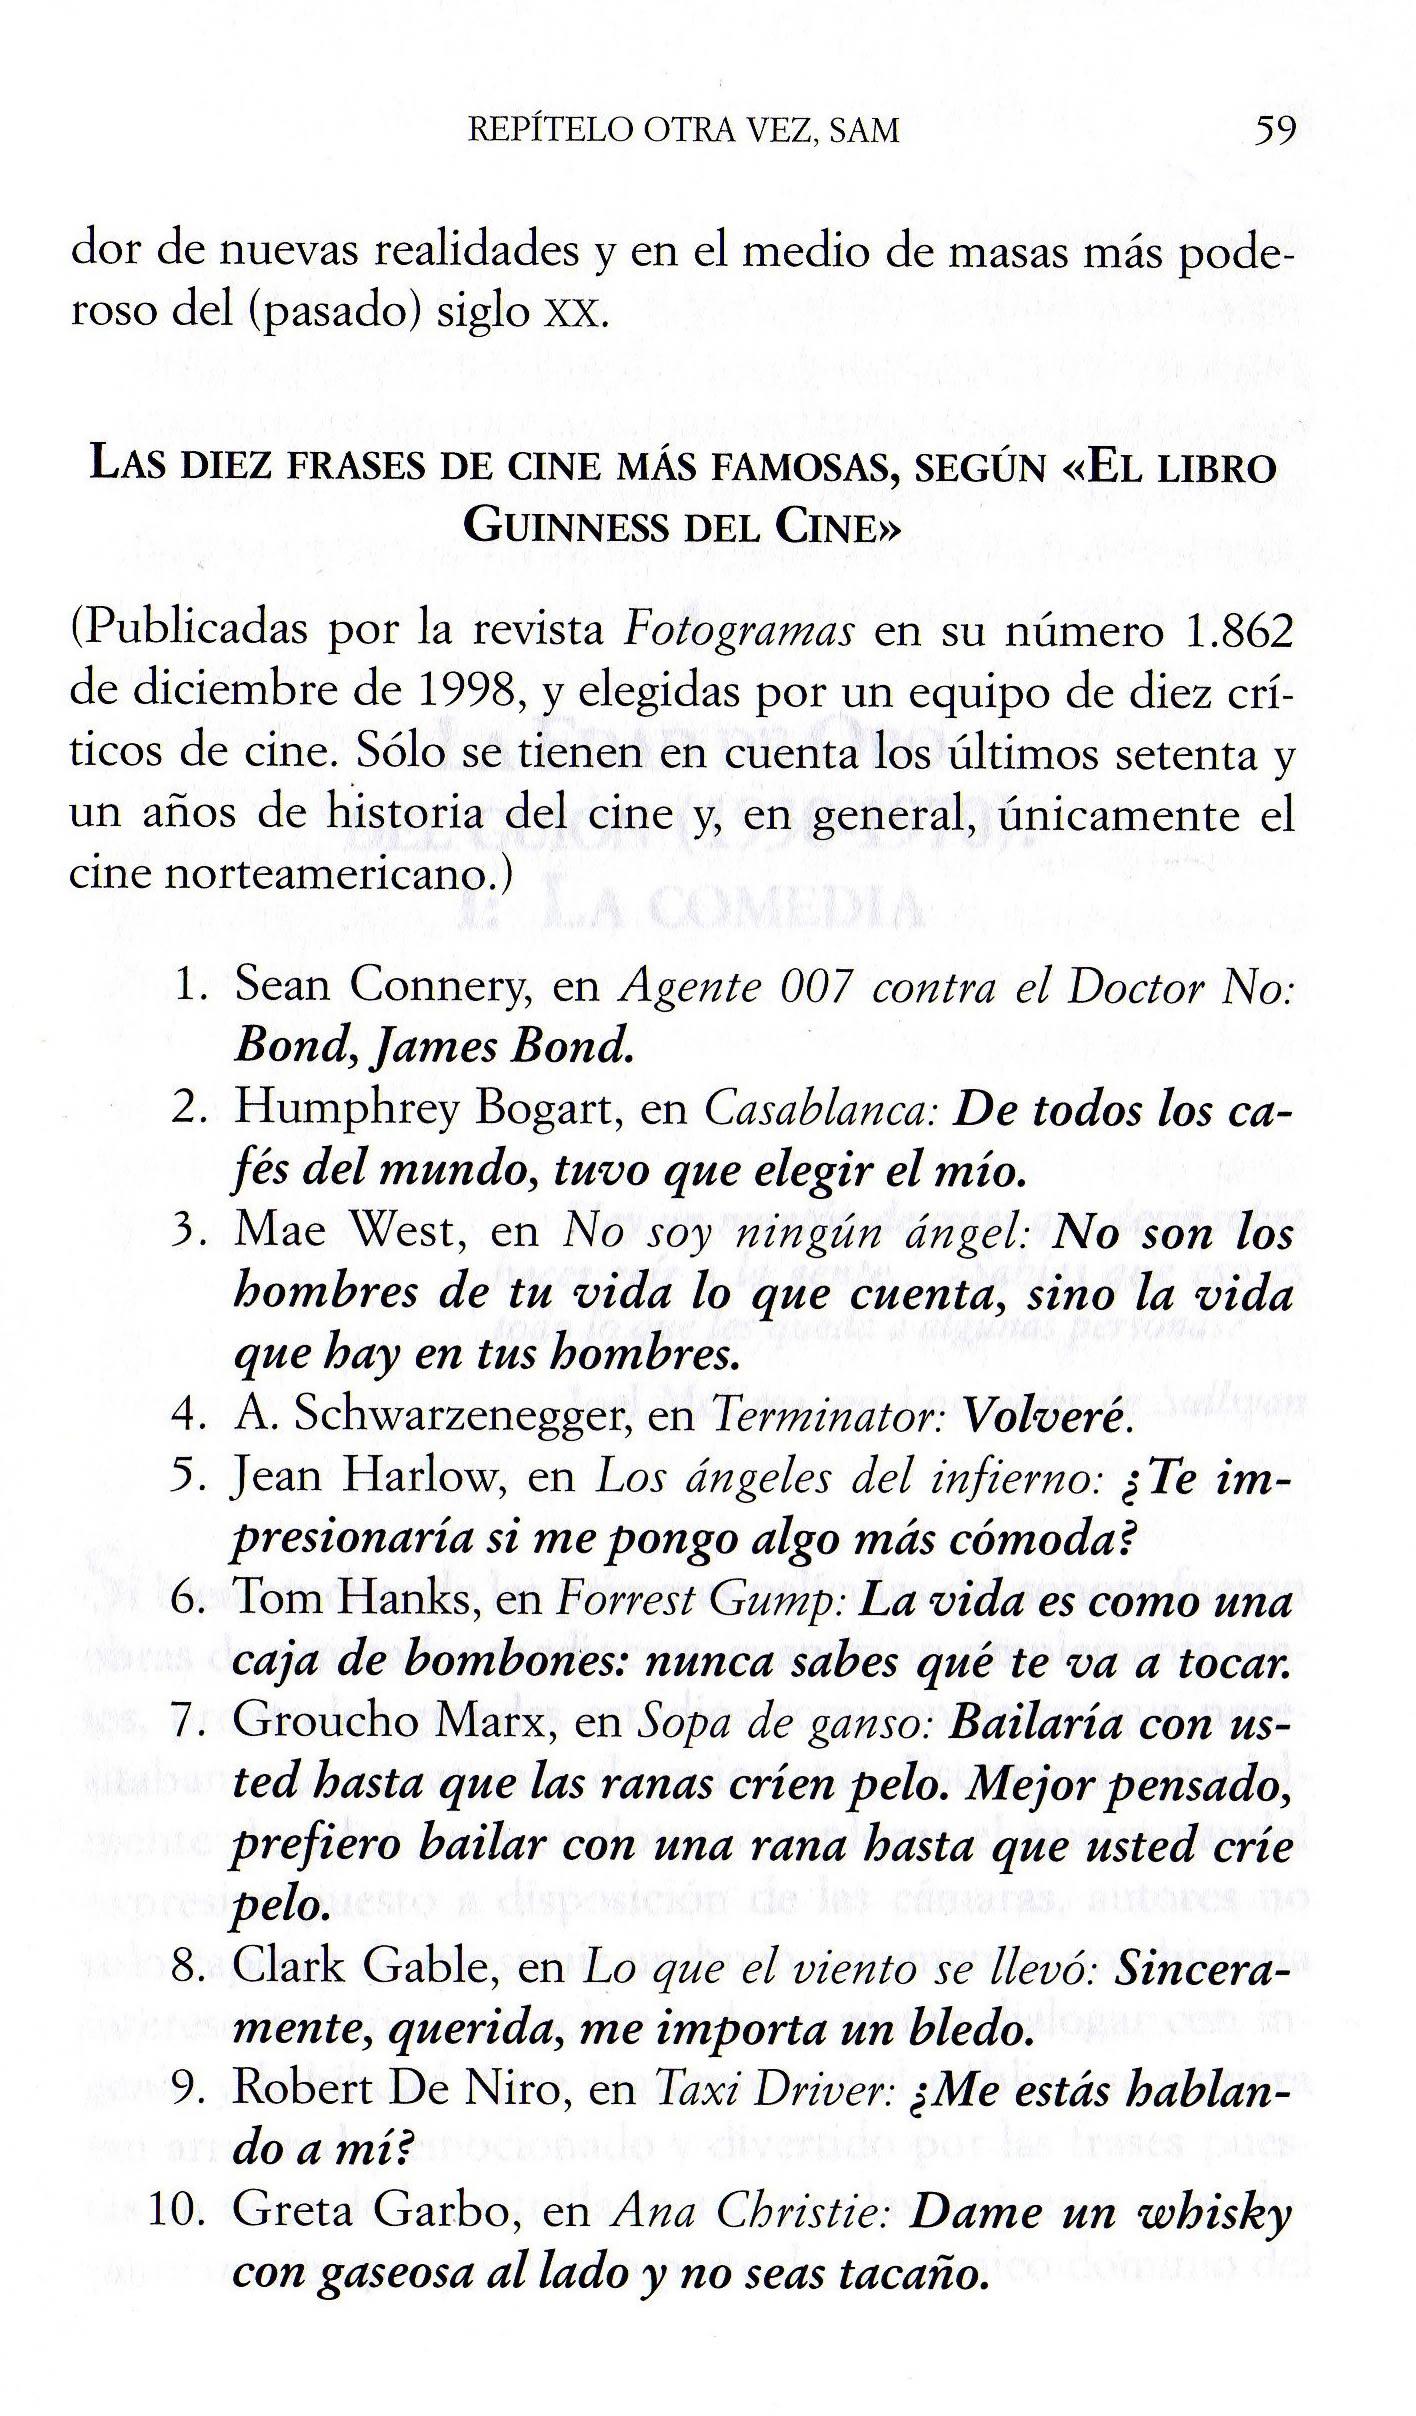 https://www.archivo007.com/images/Alegrame_el_dia_-_Jesus_Palacios_-_2007.jpg